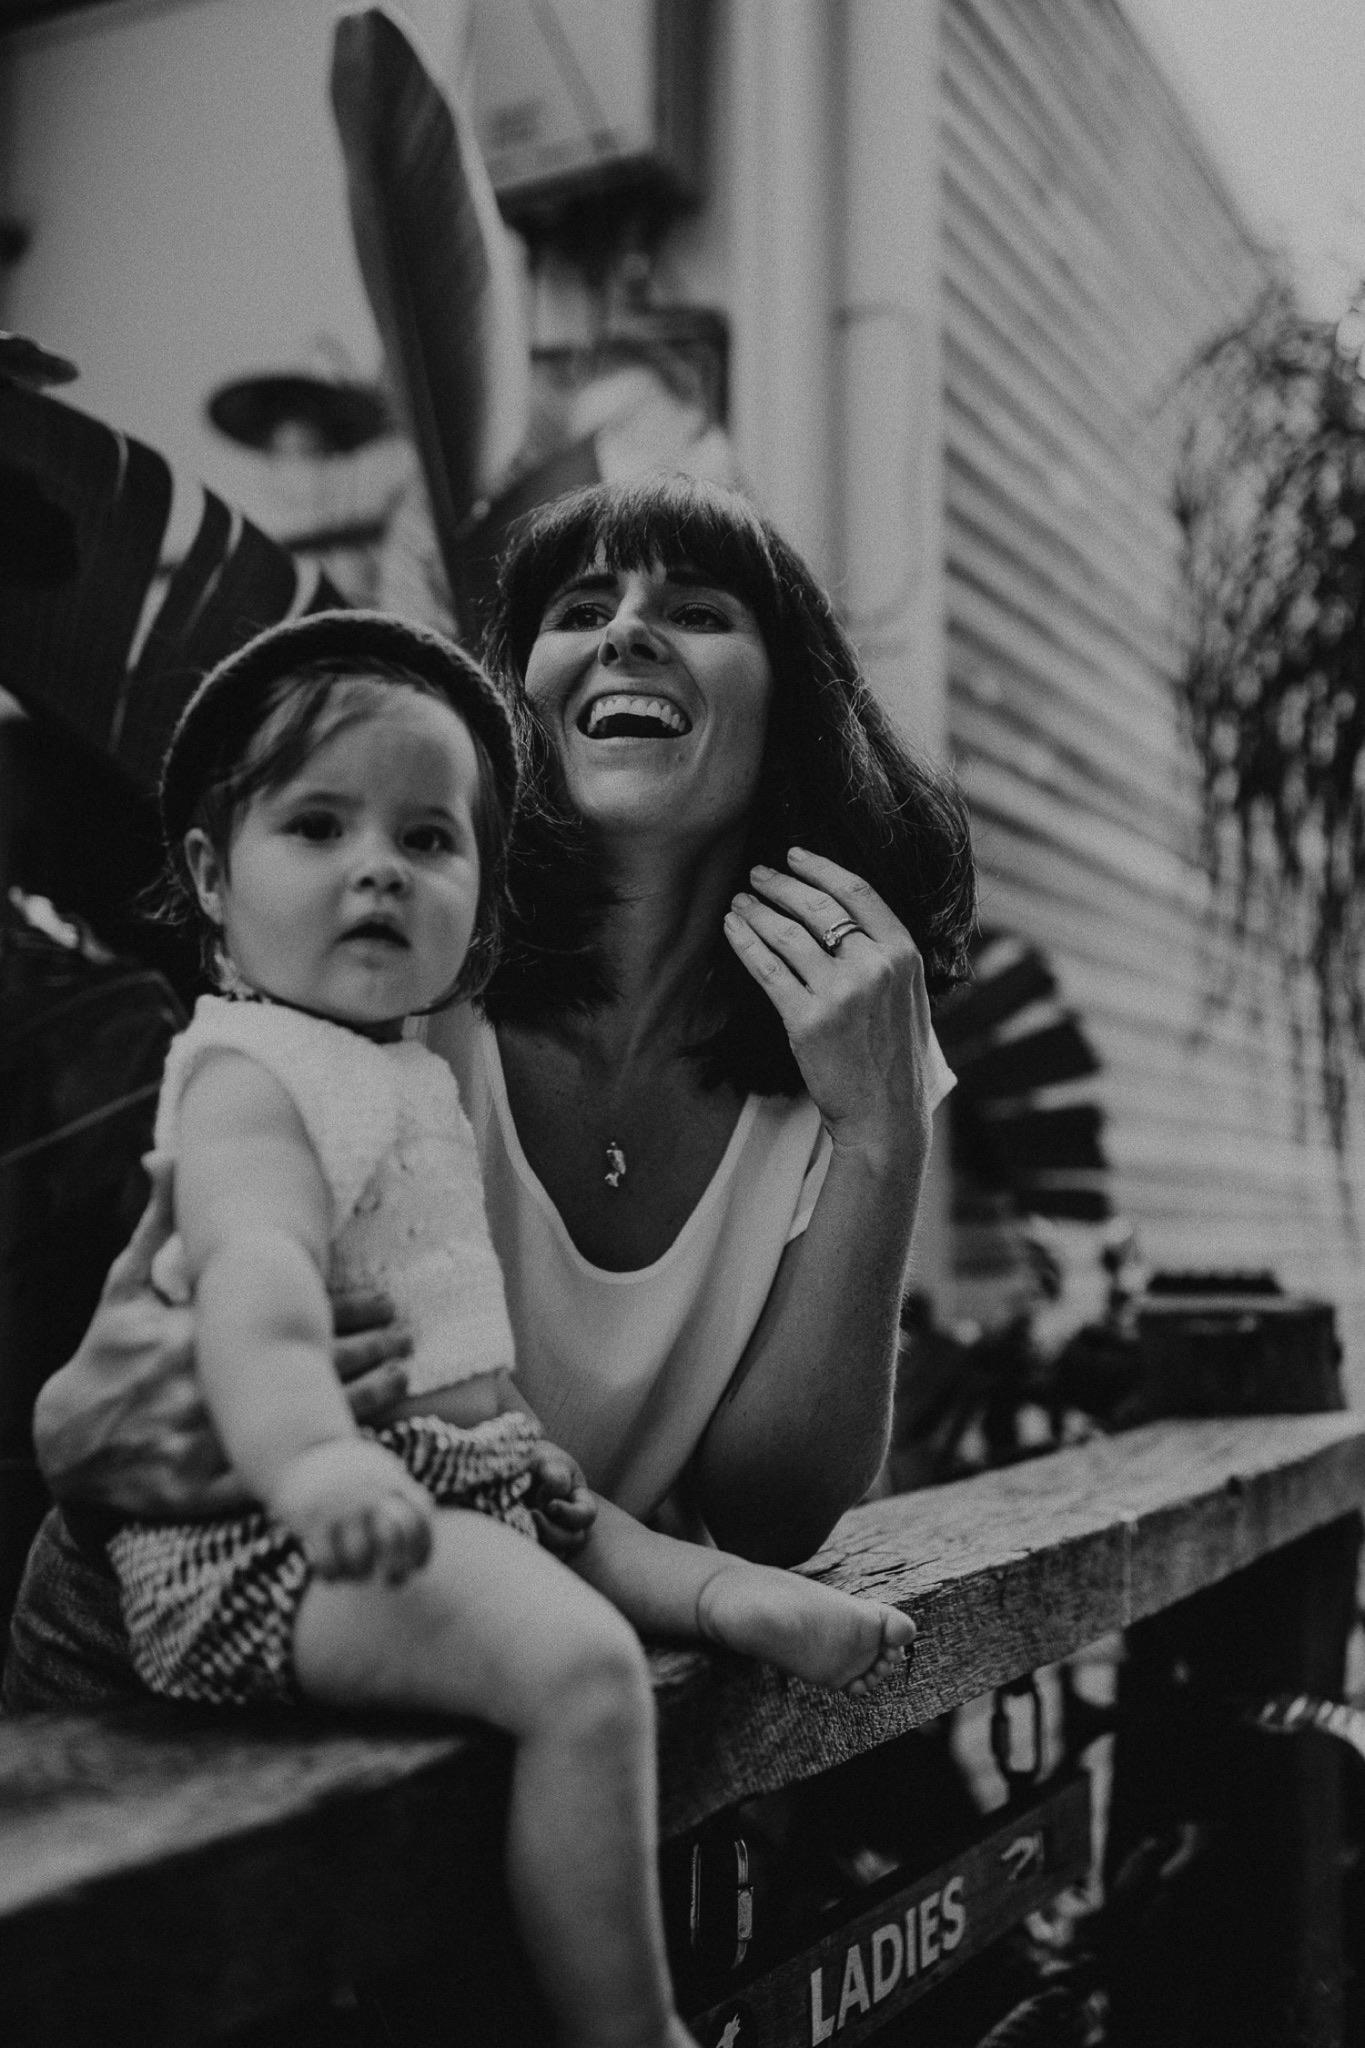 000000049_LOVEHERWILDPHOTOGRAPHY_176_Familylifestlyephotographer_Loveherwildphotography_Familyphotographerbyronbay_byronbay_motherhoodphotography_Motherhood_palmbeachphotographer_goldcoastphotographer_brunswickheads.jpg